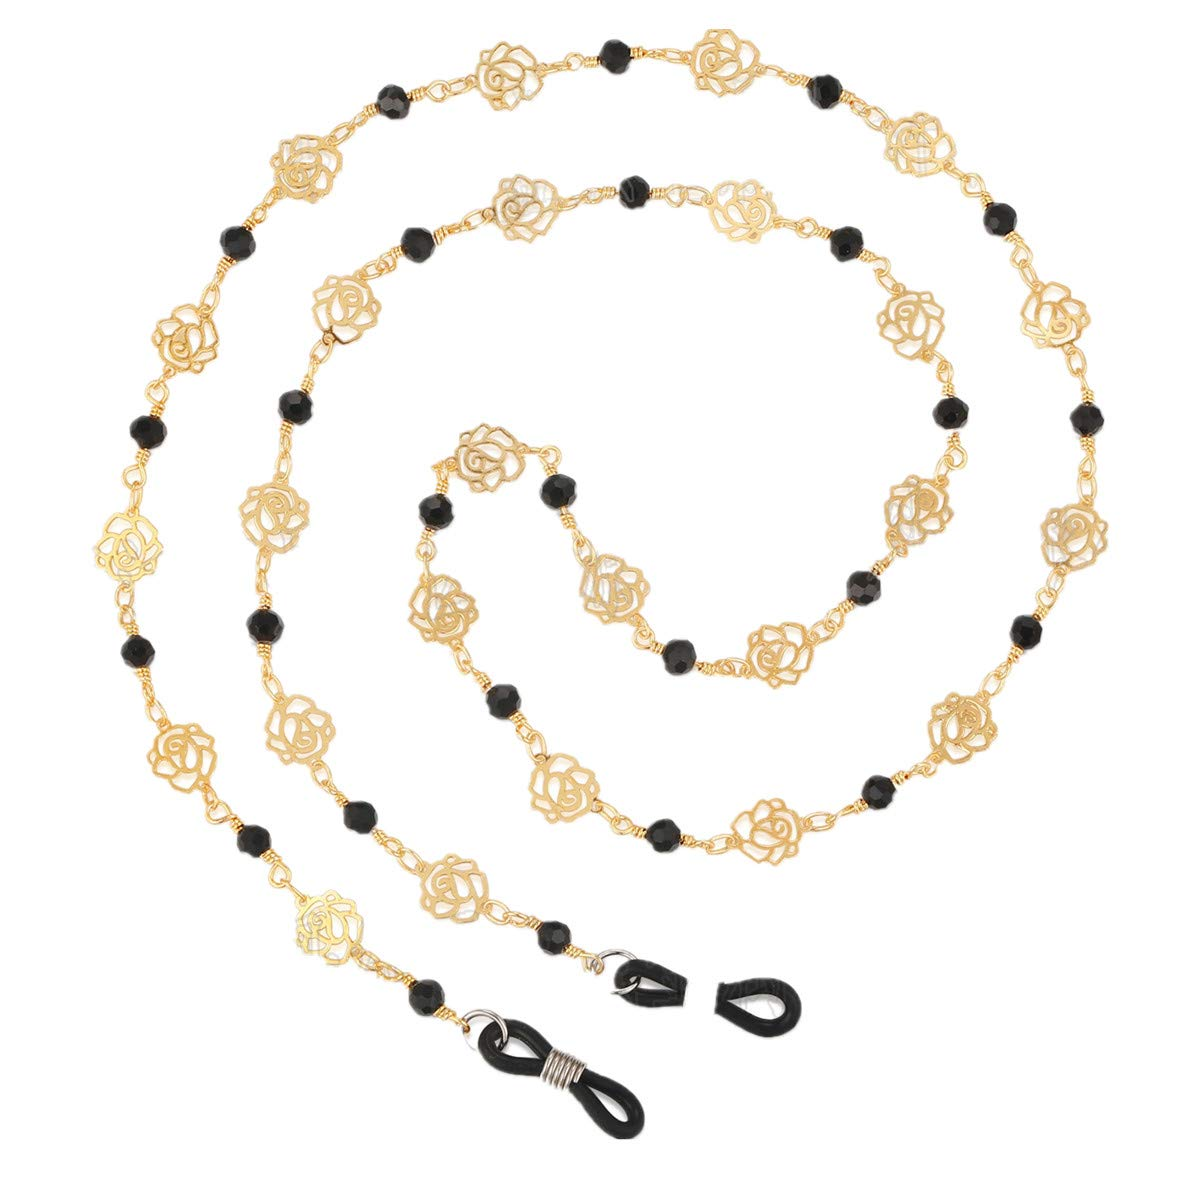 Stainless steel Eyeglass Chain Sunglasses Holder Strap Eyewear Lanyard (Golden Flower)